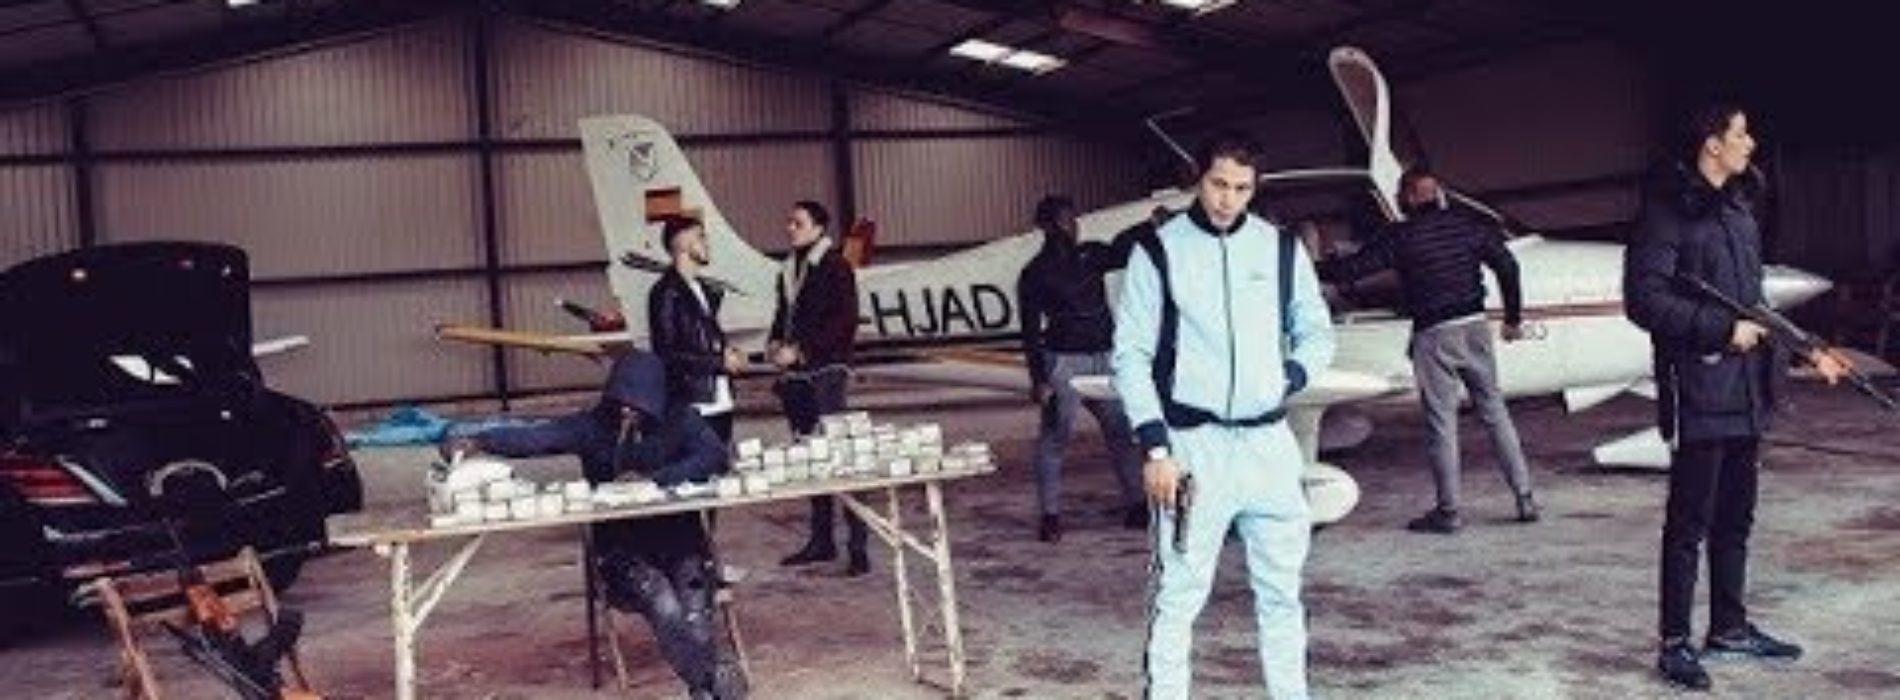 Actualités Rap Français – MÉDINE – Venom /BIGFLO& OLI  / HAYCE LEMSI- Havana / MADRANE – Force / DOSSEH – KFC / TIMAL – La 8 (Chivas) / HORNET LA FRAPPE – Boca / LORENZO – Carton Rouge / MOHA LA SQUALE – Bandolero – Février 2018